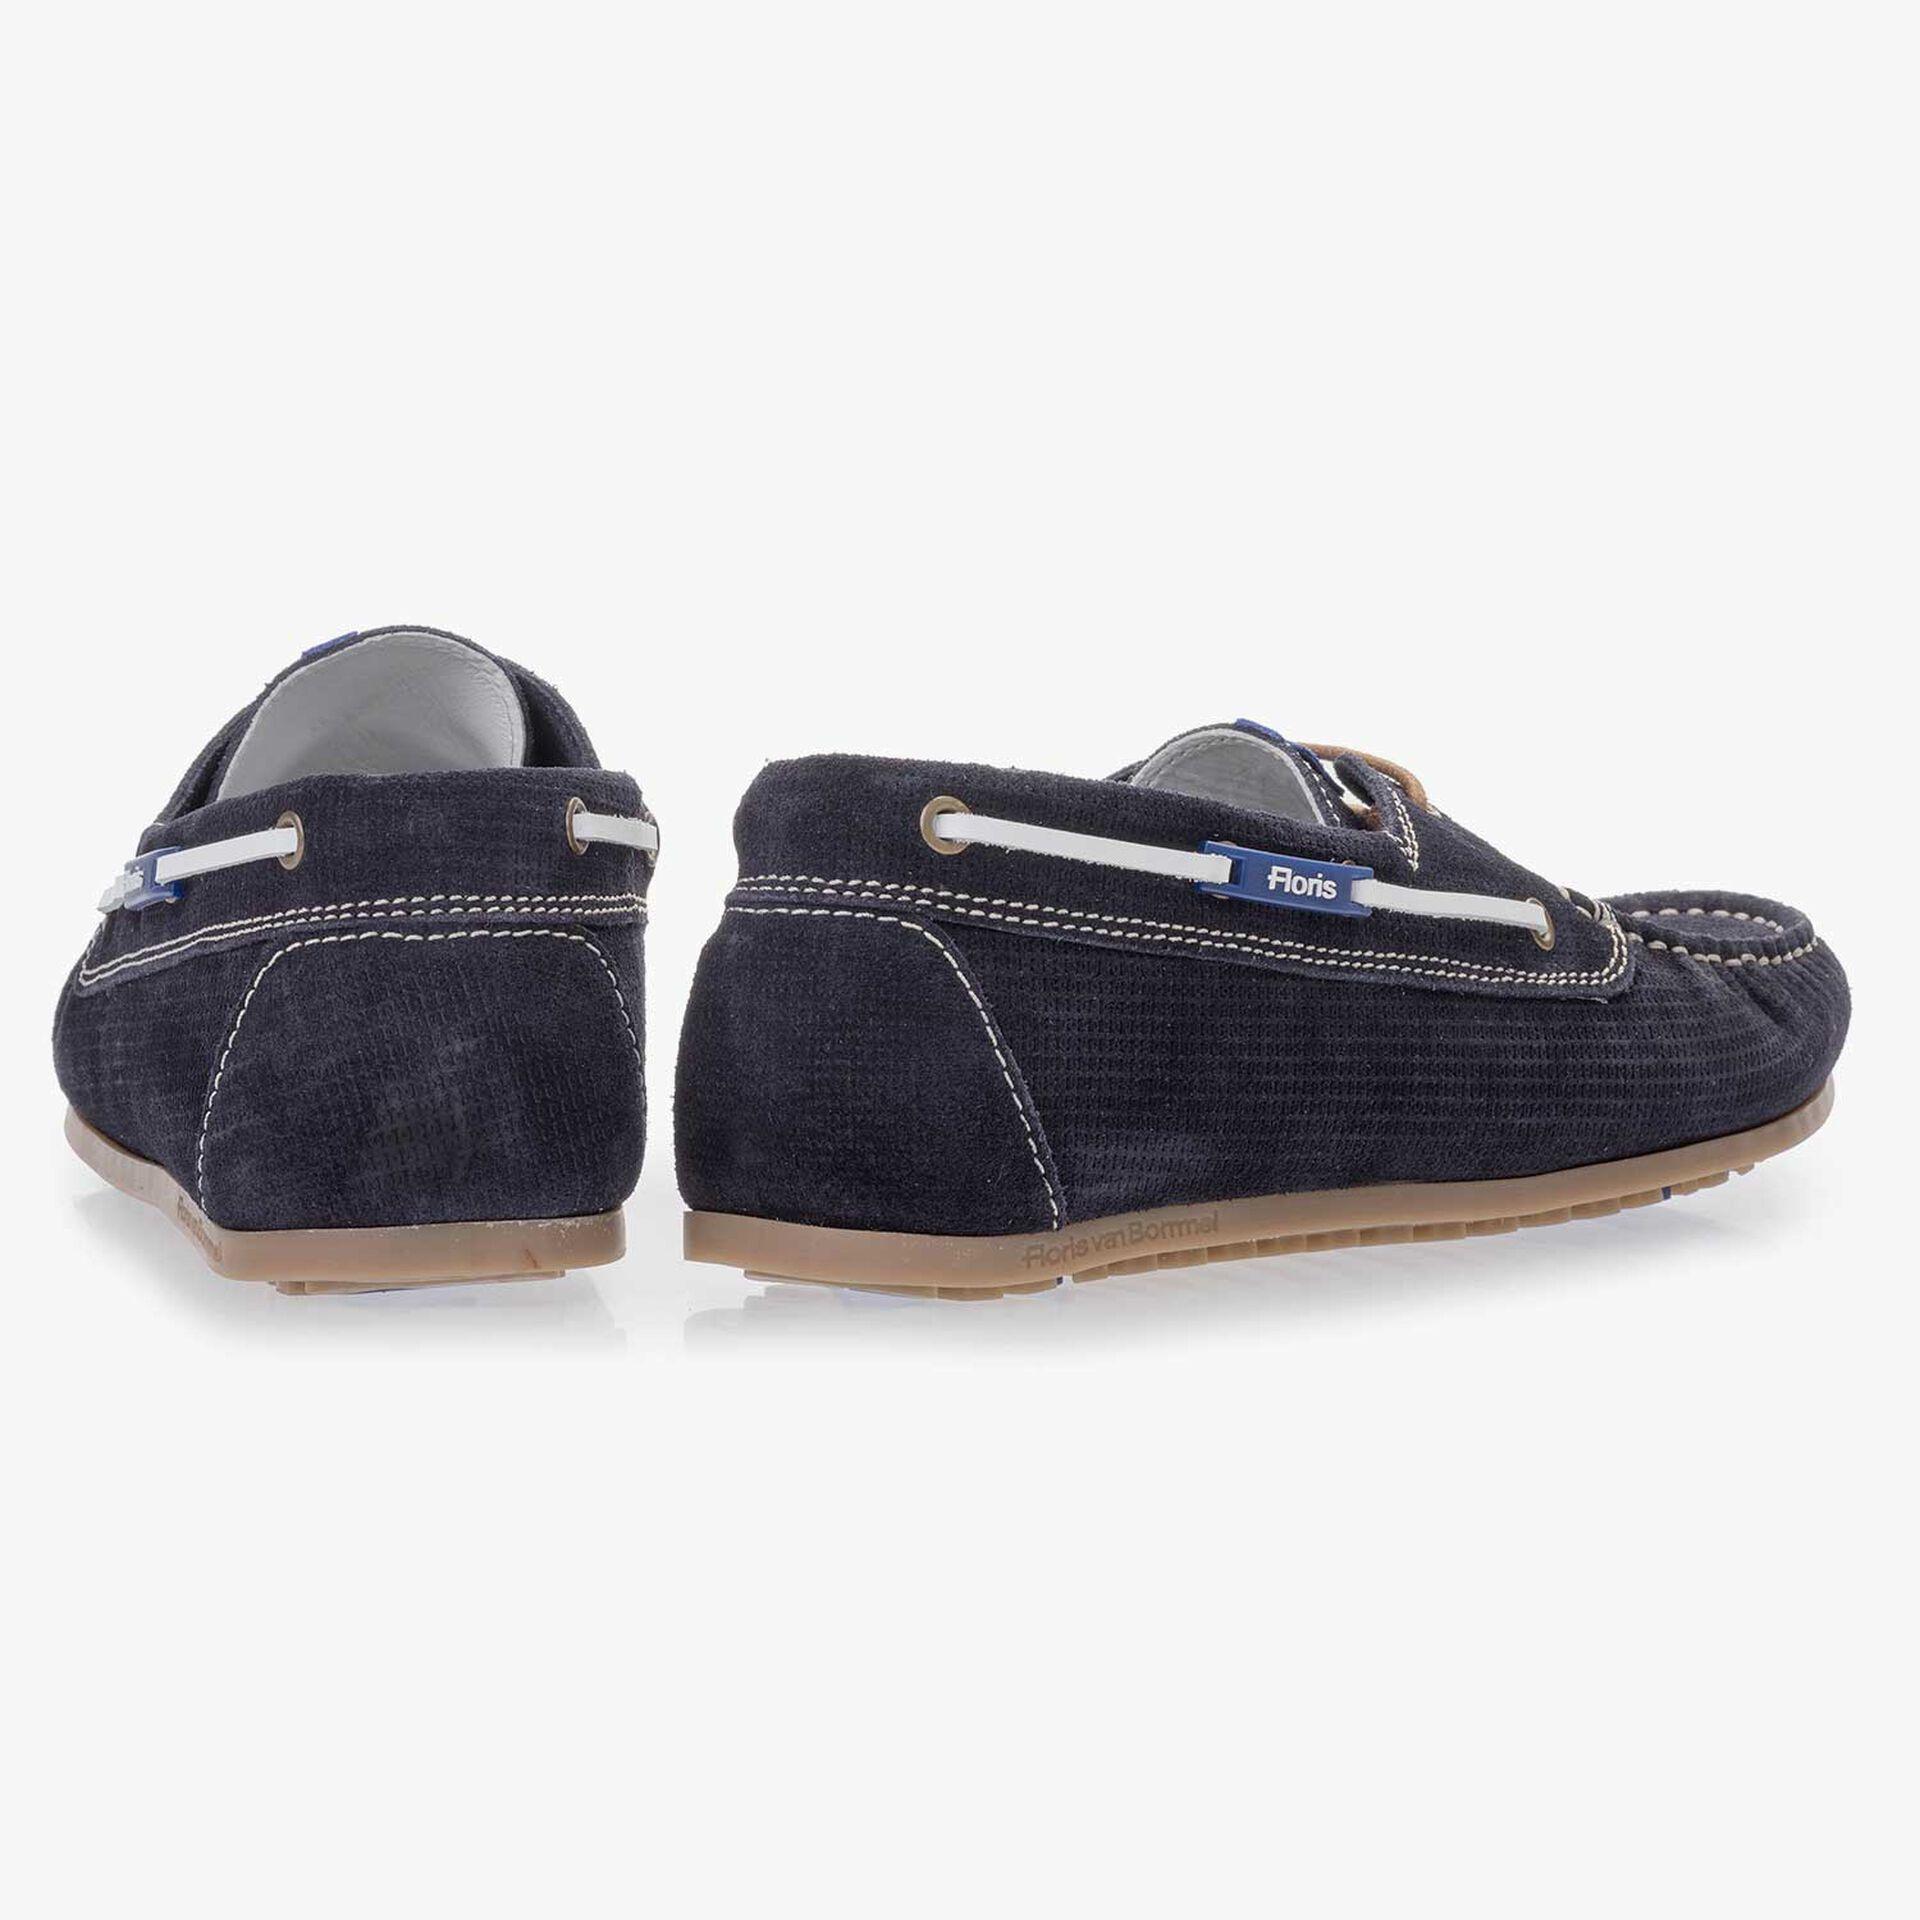 Dark blue, patterned suede leather boat shoe